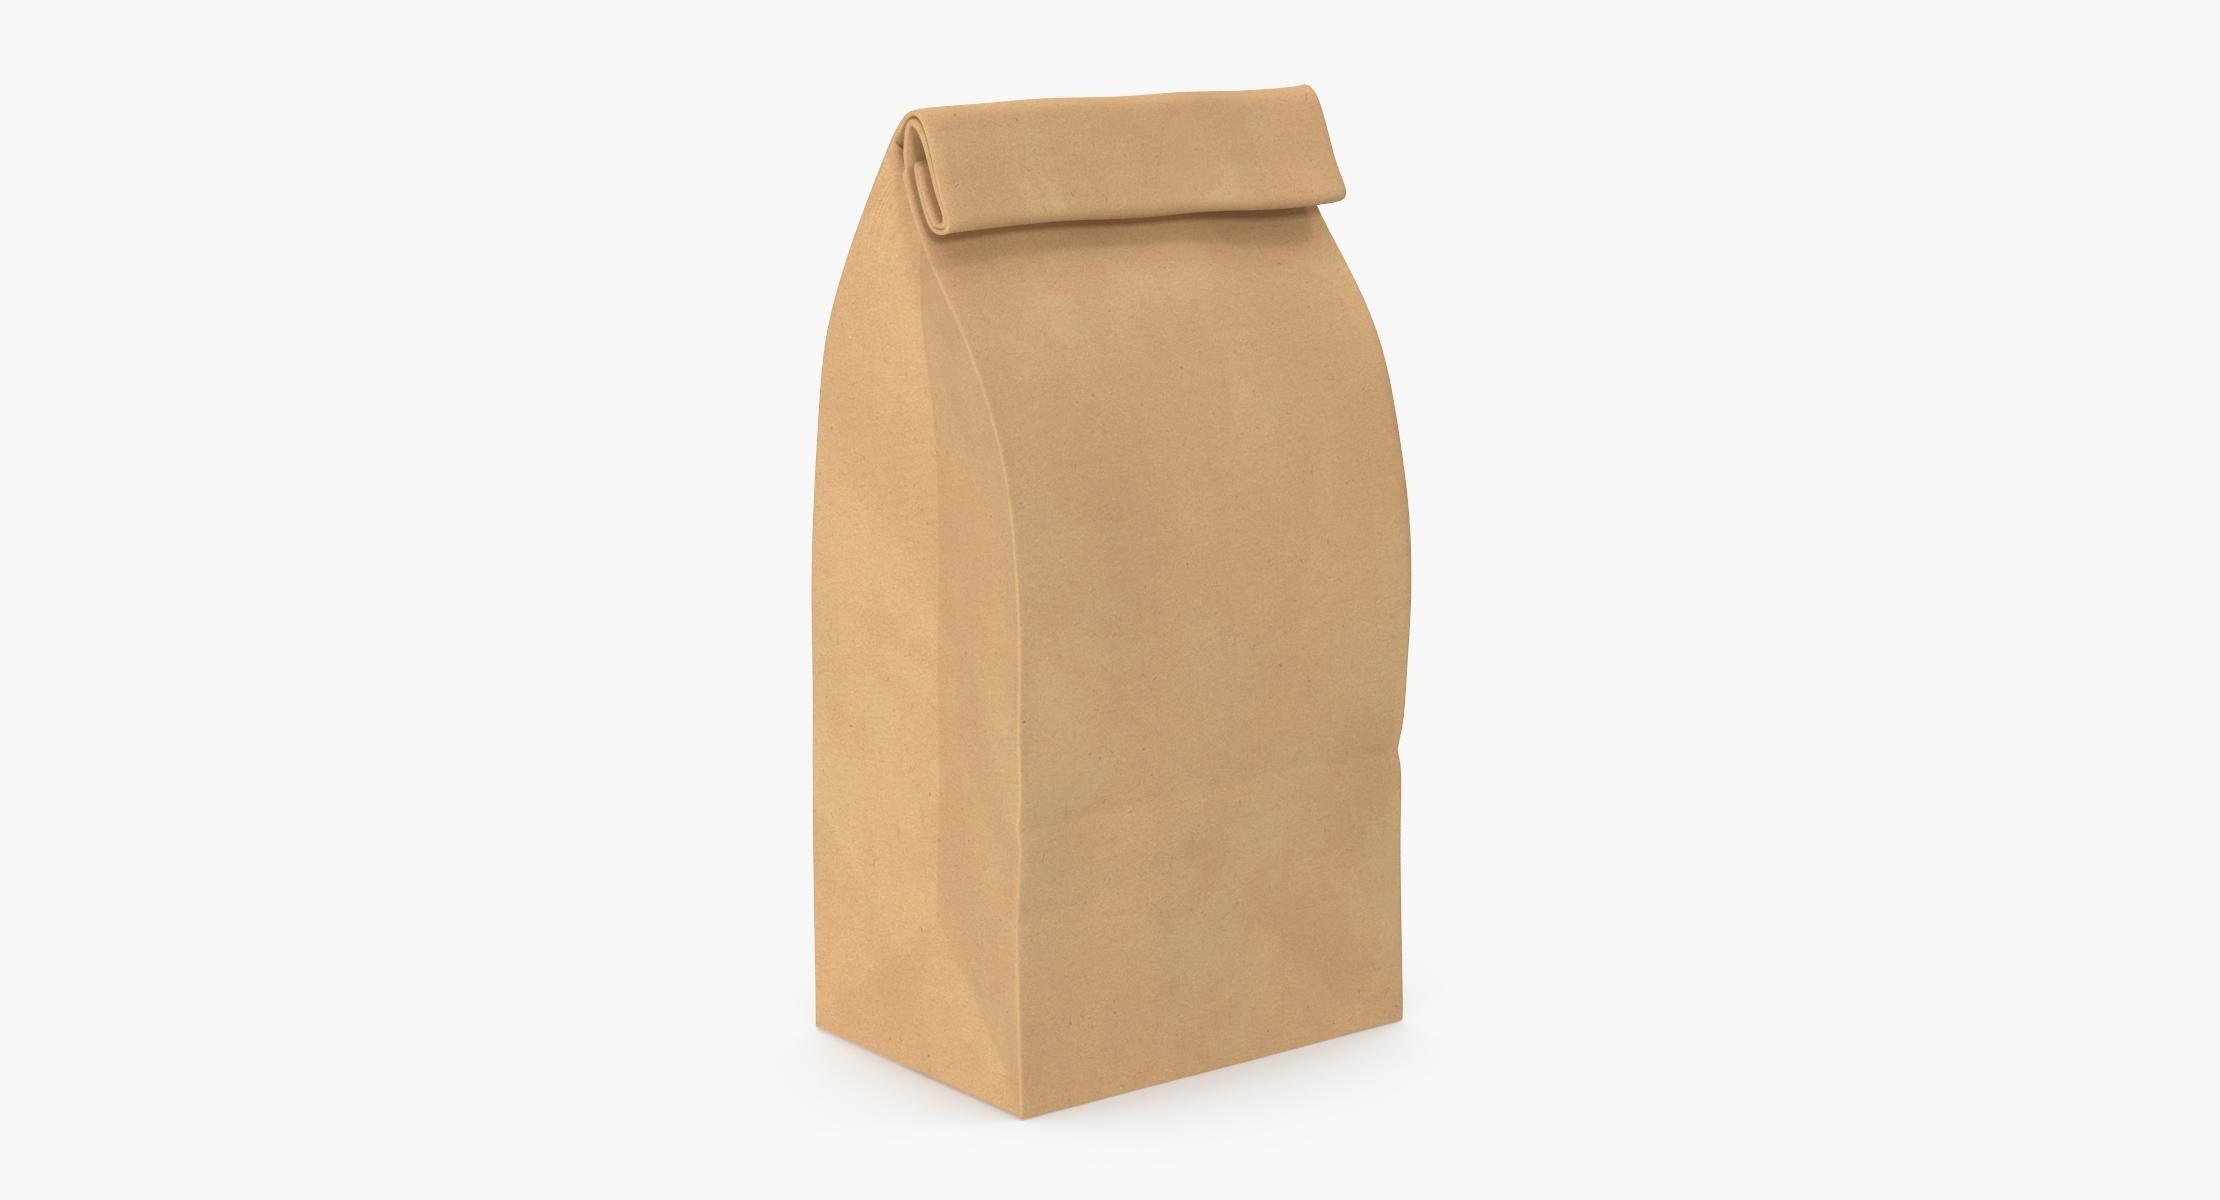 Grocery Bag No Handle Mockup Small Closed - reel 1